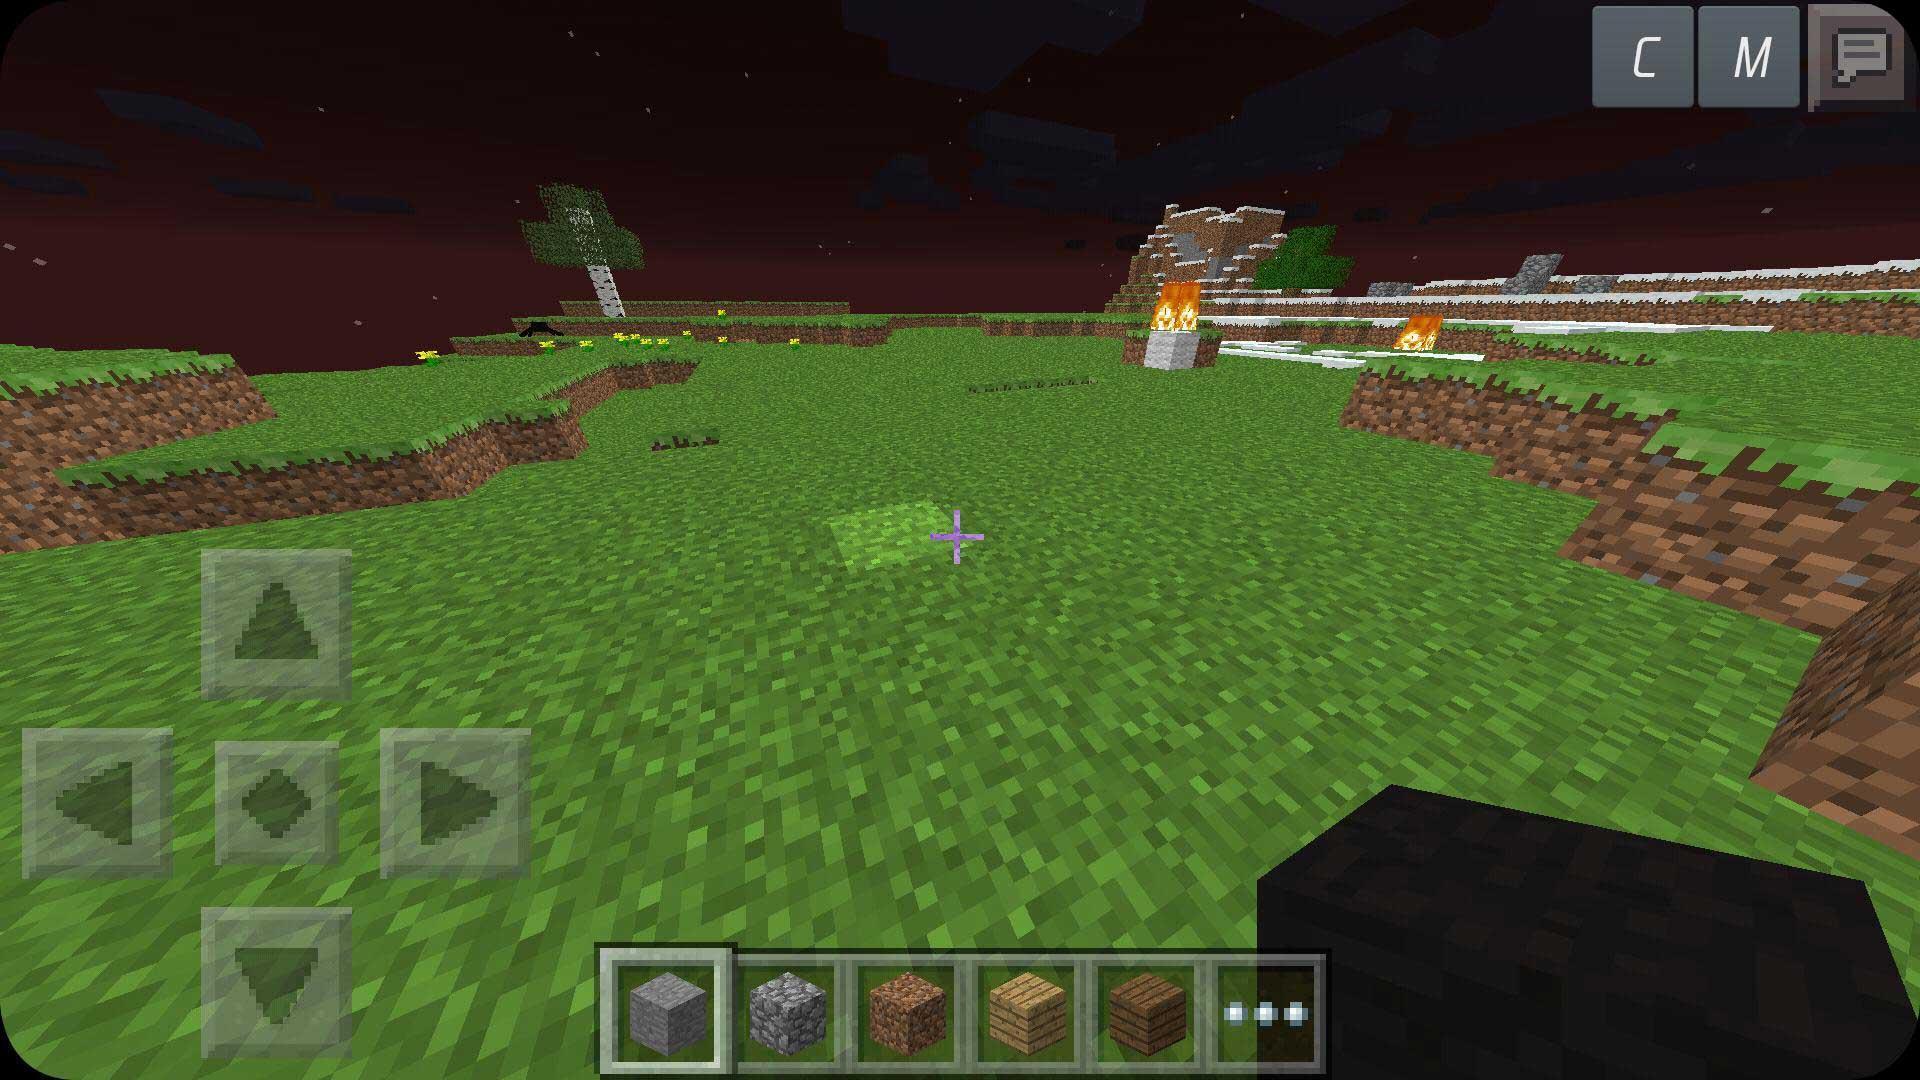 CactiPE Mod Menu for Android - APK Download